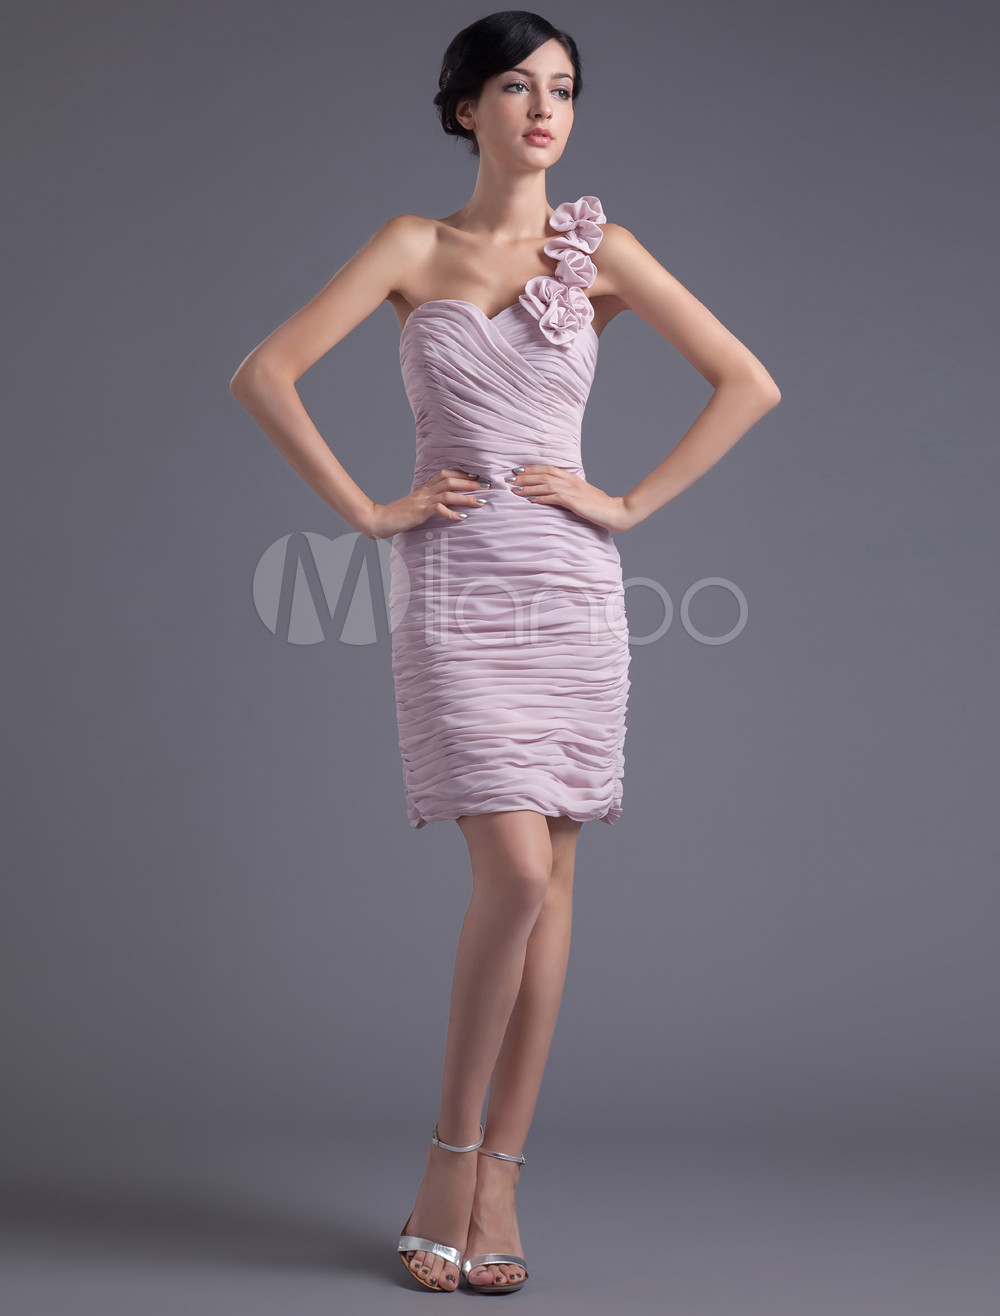 Sheath Pink Chiffon Floral One-Shoulder Short Bridesmaid Dress (Wedding Bridesmaid Dresses) photo